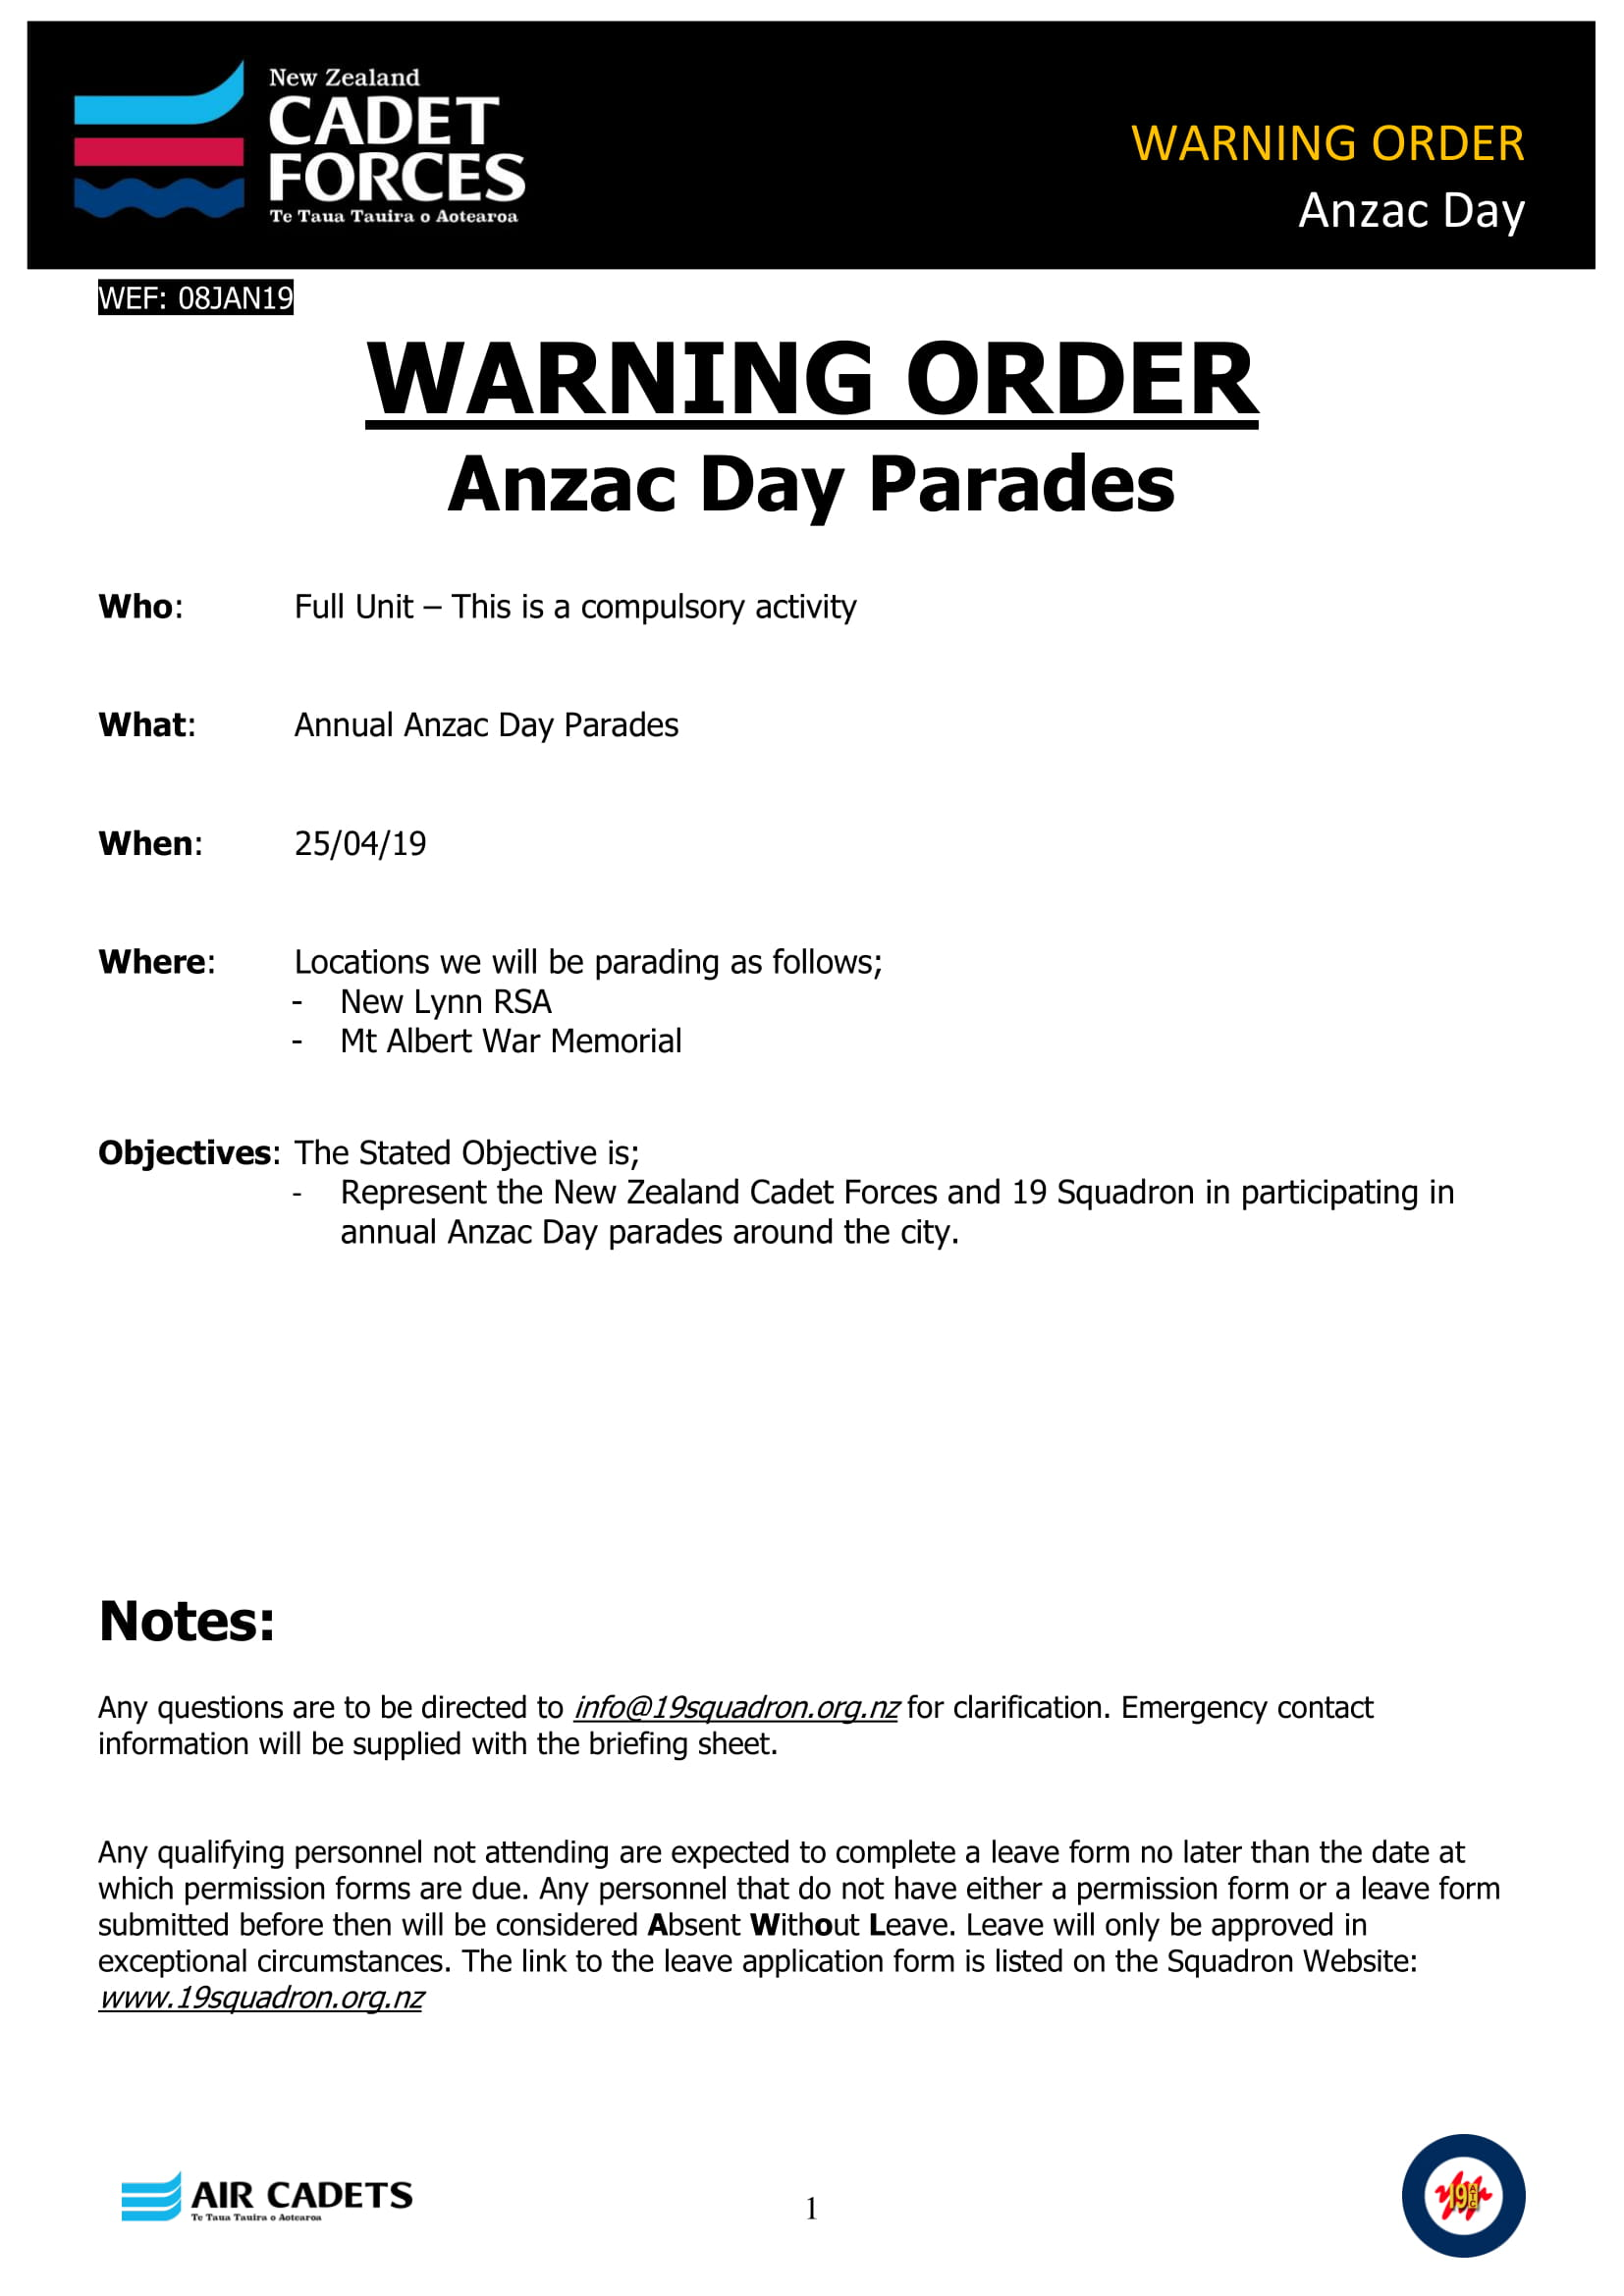 Anzac Day - Warning Order-1.jpg